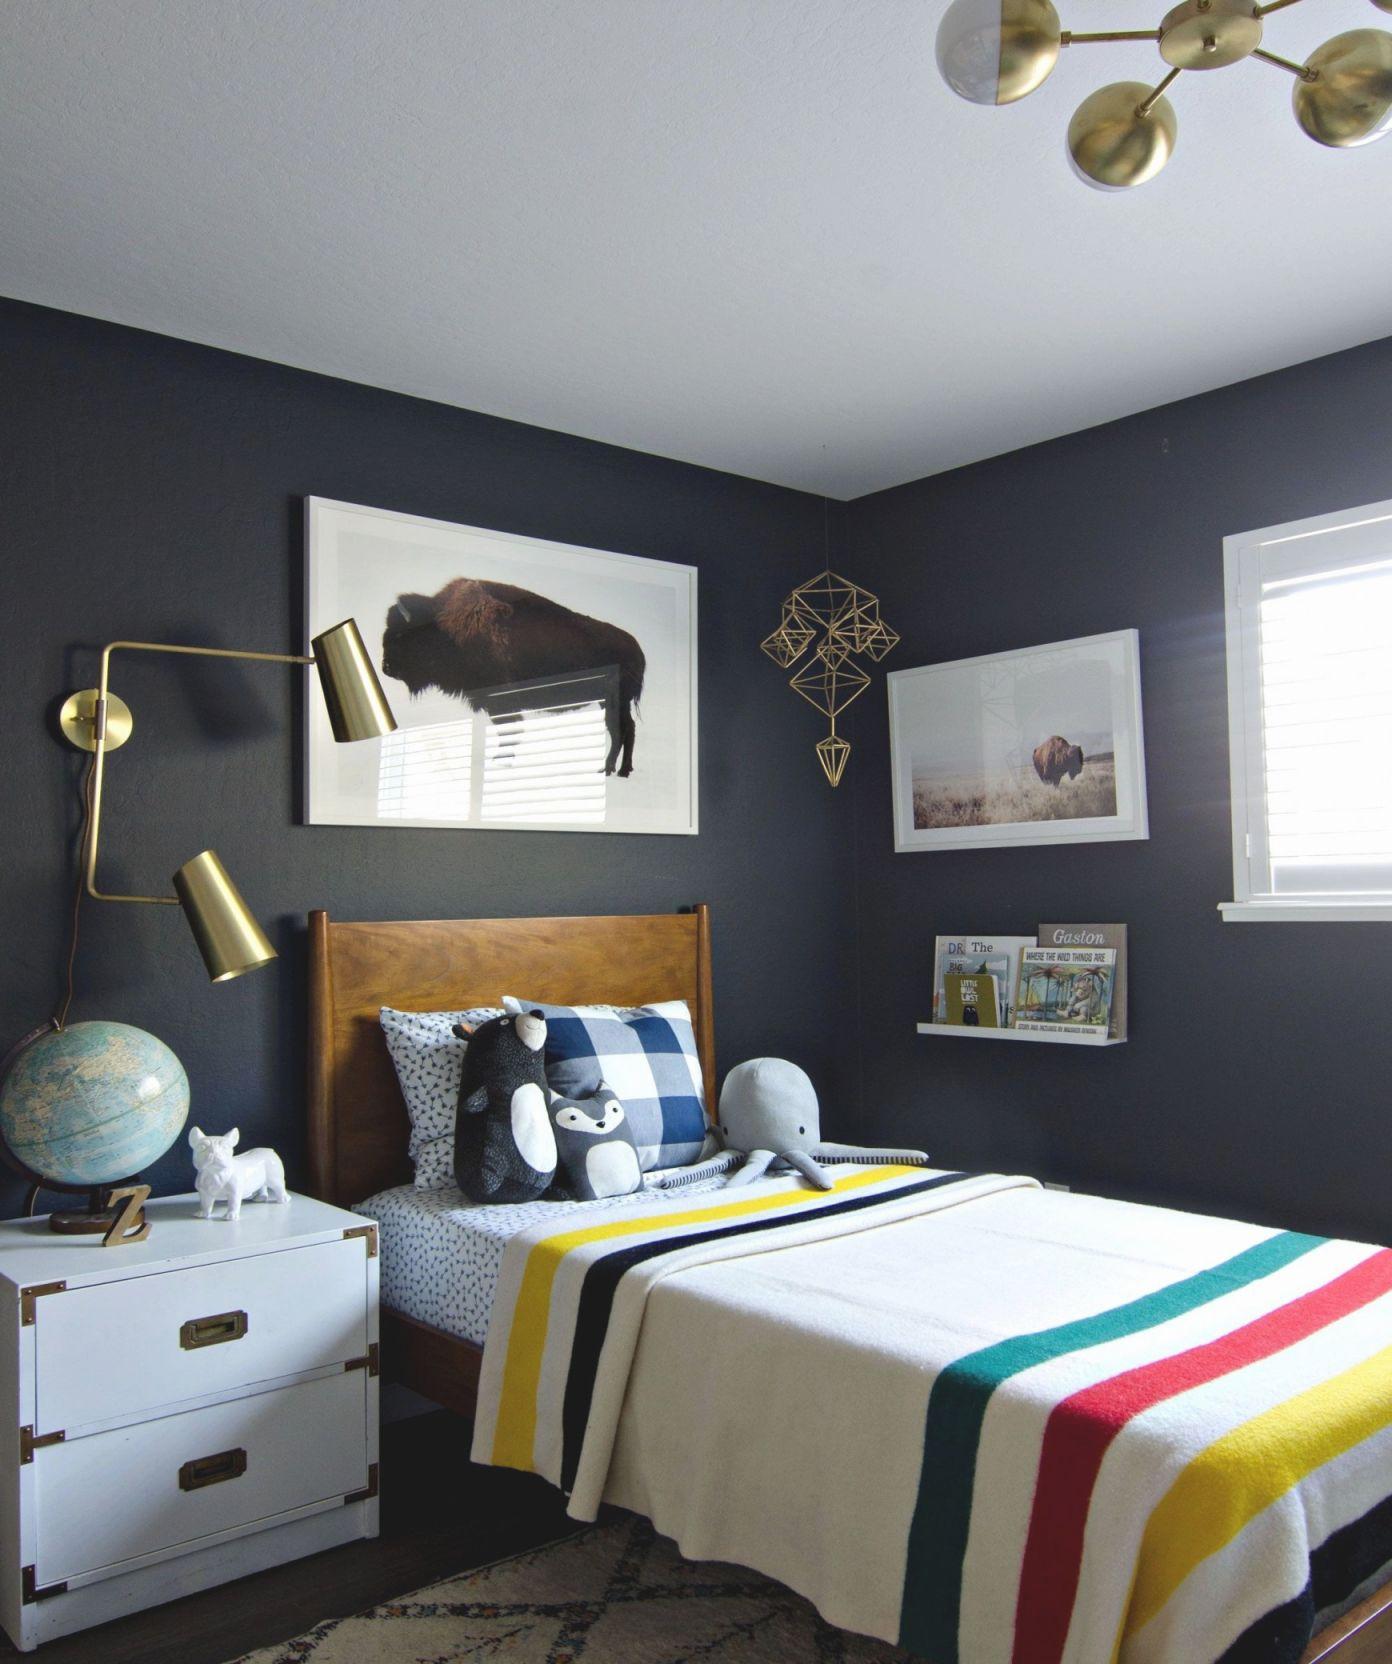 Bedroom Decoration Ideas Fresh Good Ideas To Decorate My within Ideas To Decorate My Bedroom